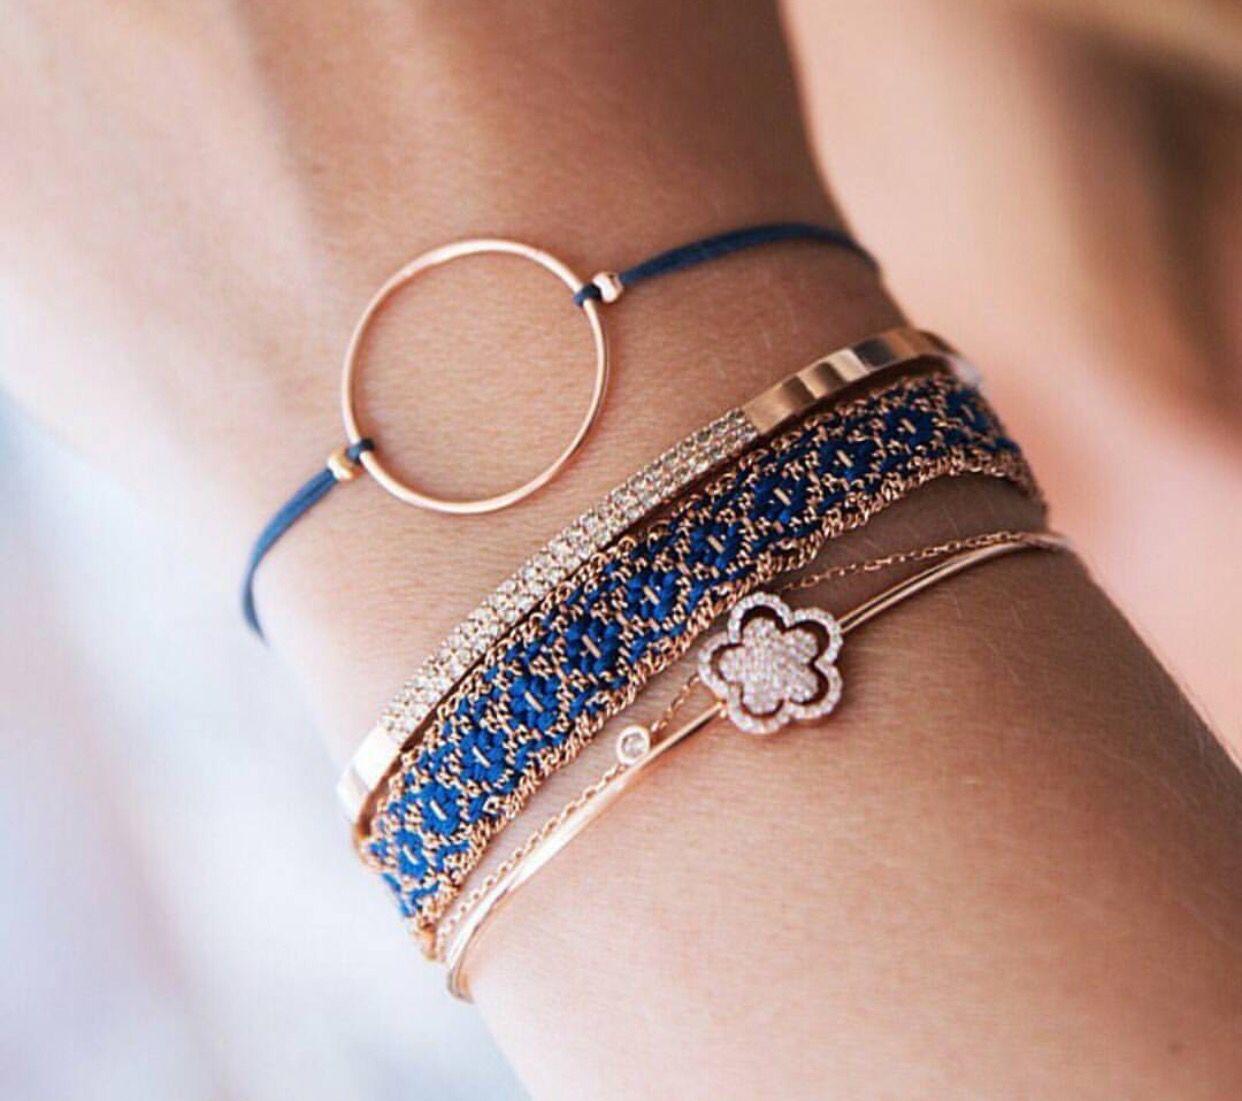 Handmade Diamond Pave Bracelet Collier connecteur or 14k Findings Jewelry 35 mm